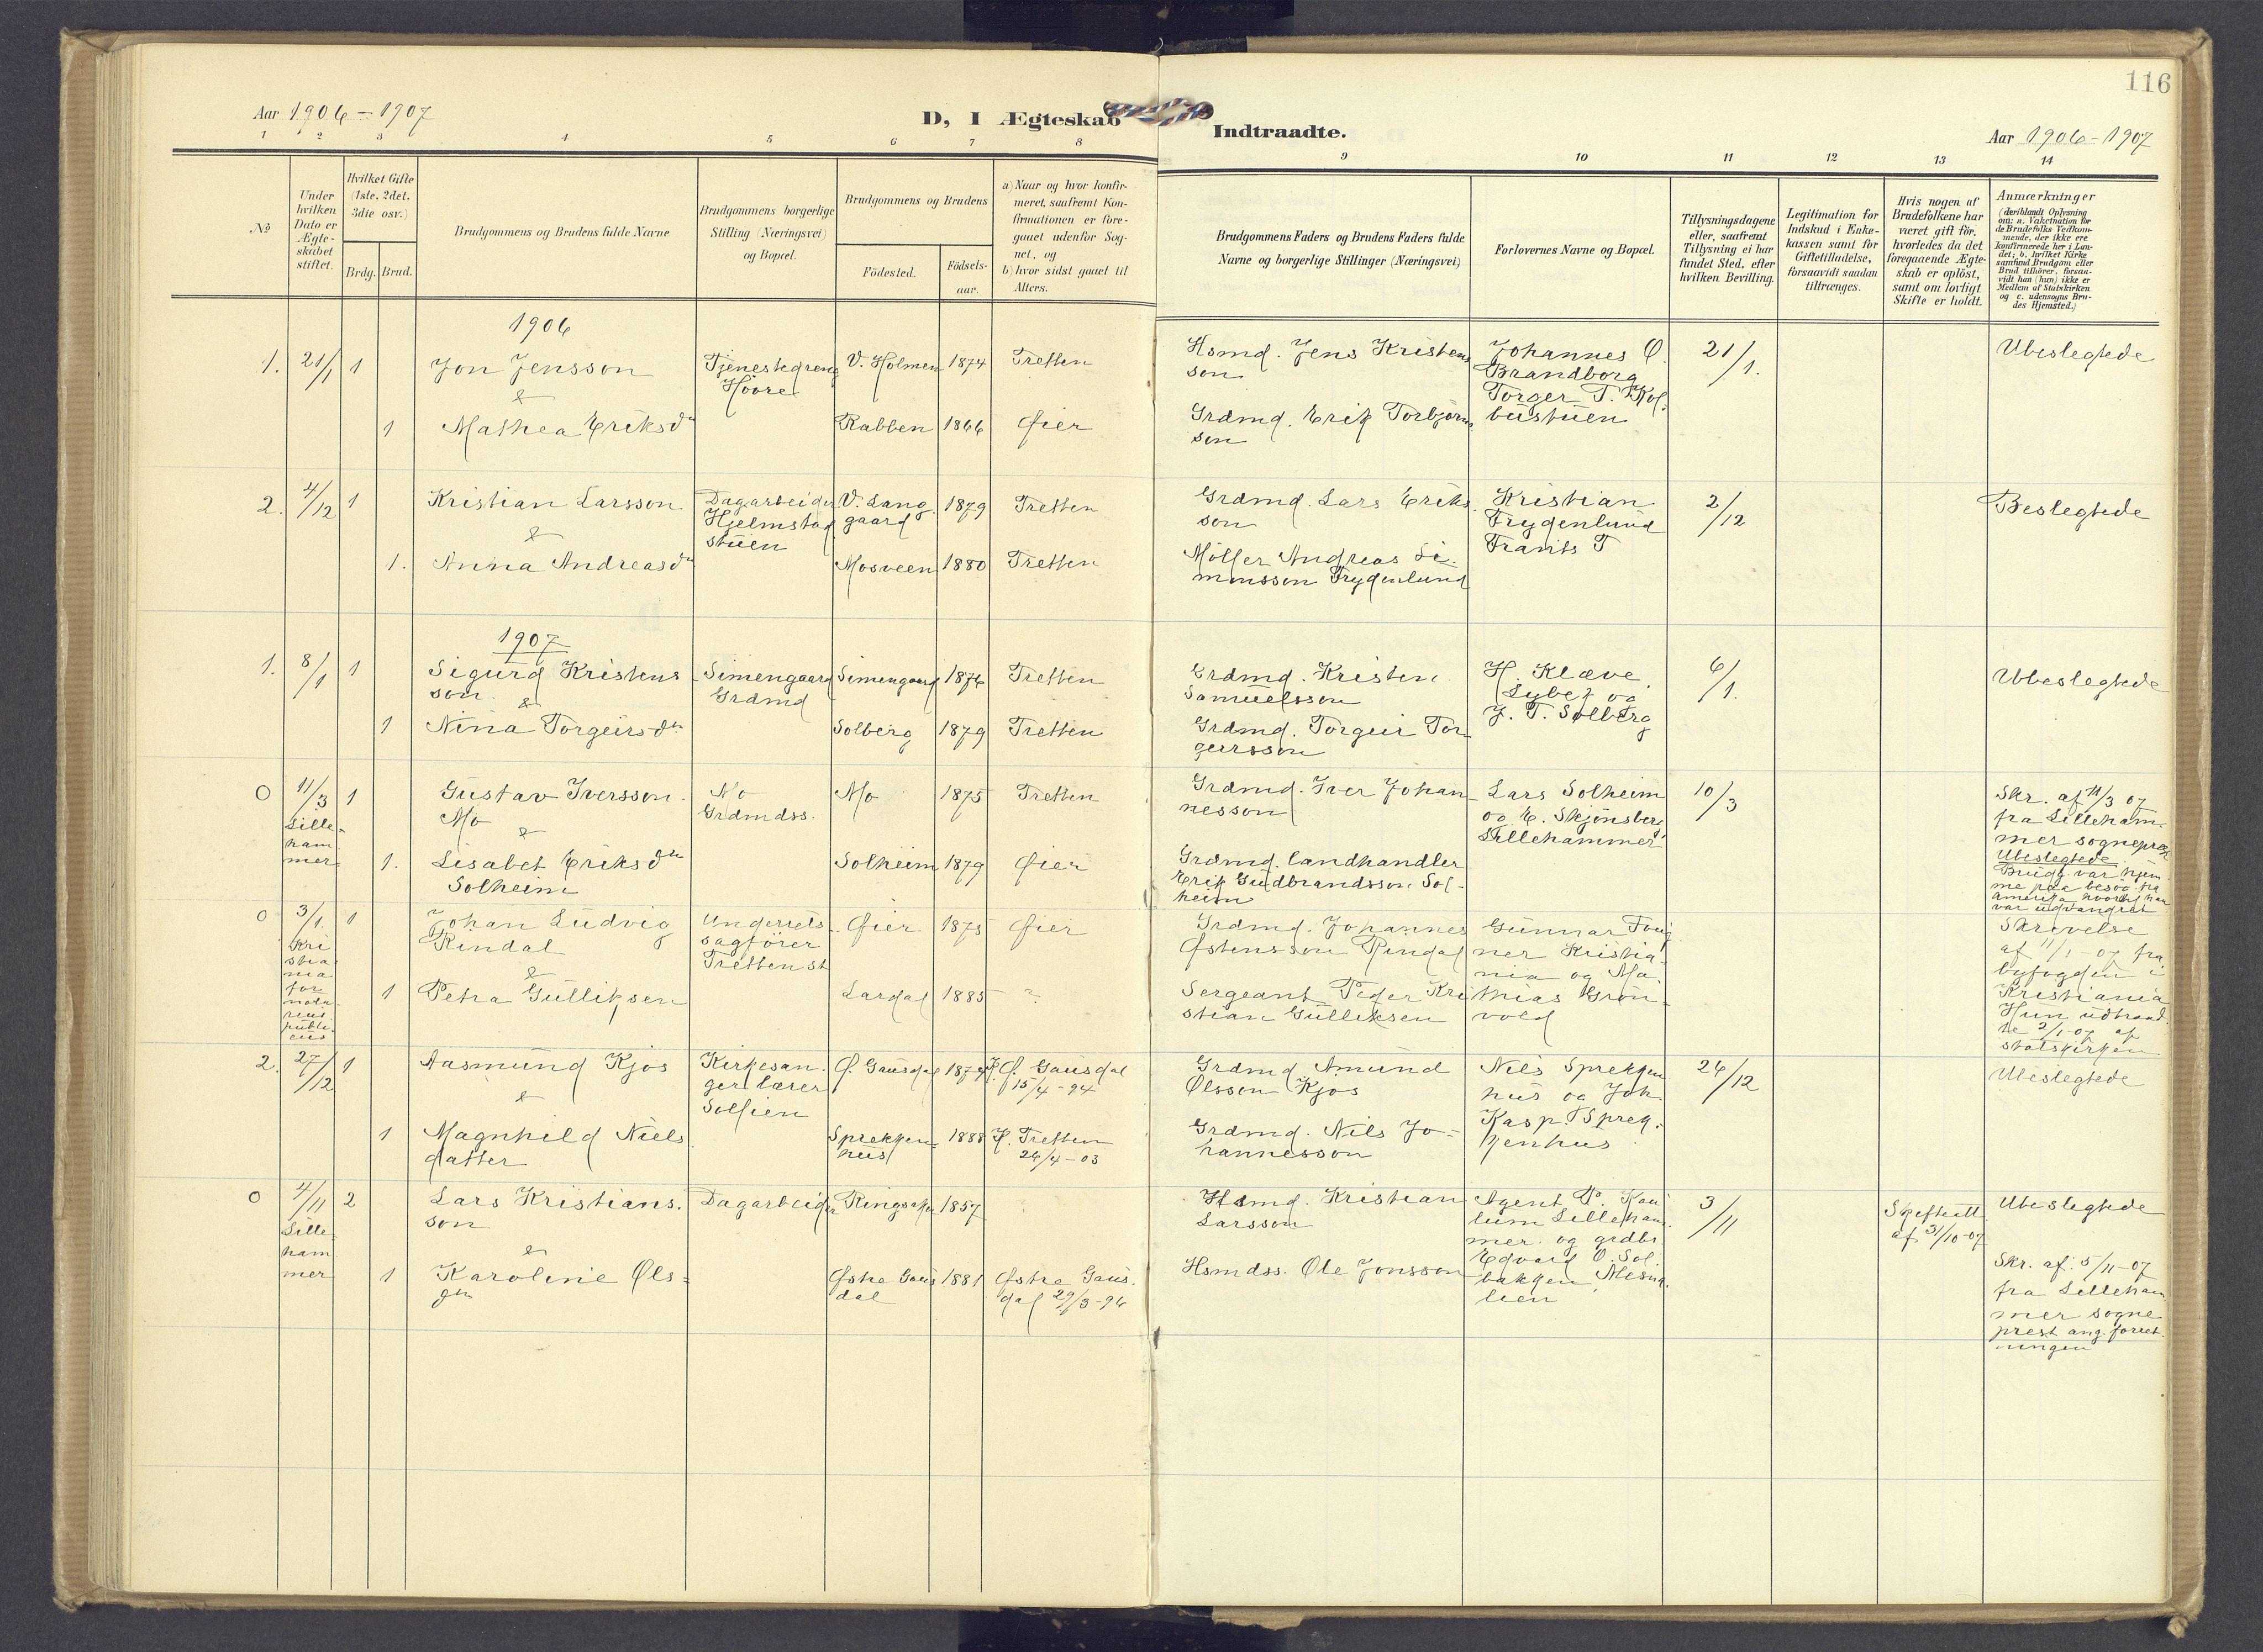 SAH, Øyer prestekontor, Ministerialbok nr. 13, 1905-1920, s. 116